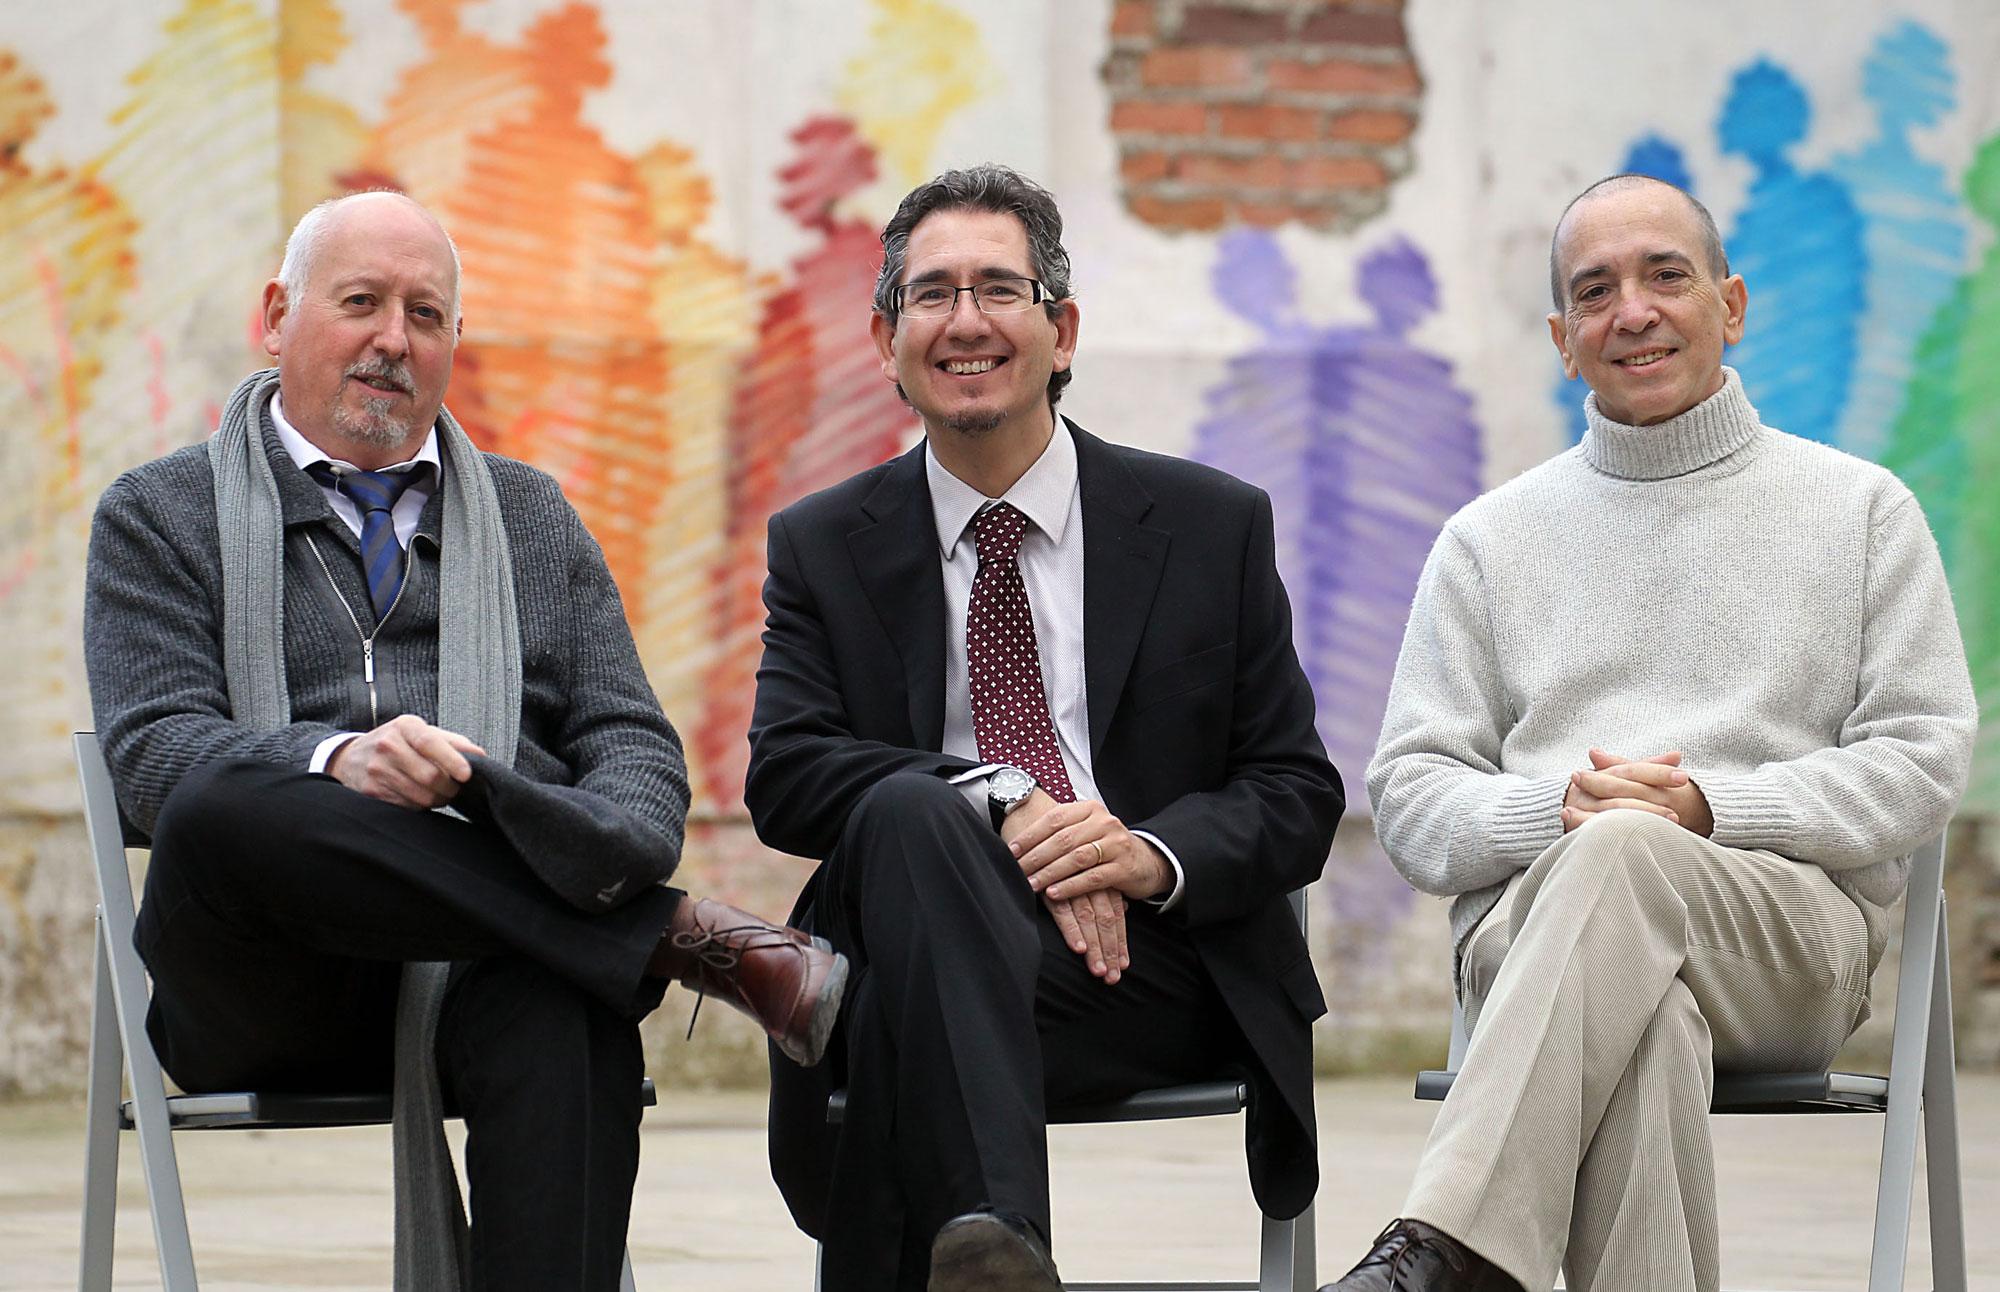 Luis Enrique González de Garay, Luis Sáez Angulo y Javier Alonso